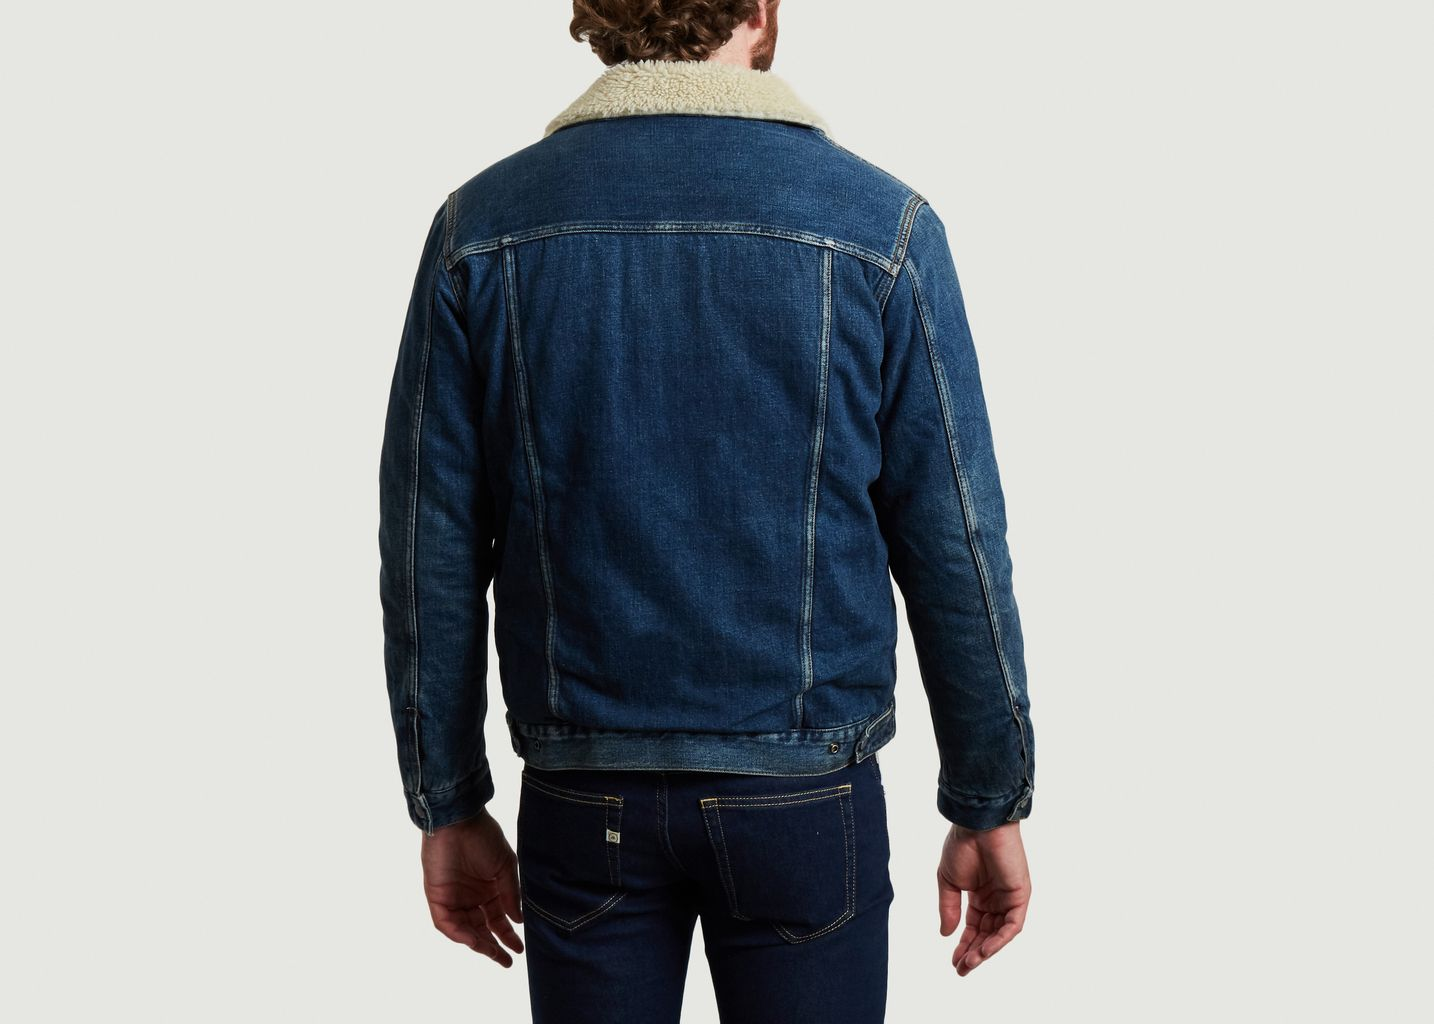 Veste en jean Bonny - Nudie Jeans